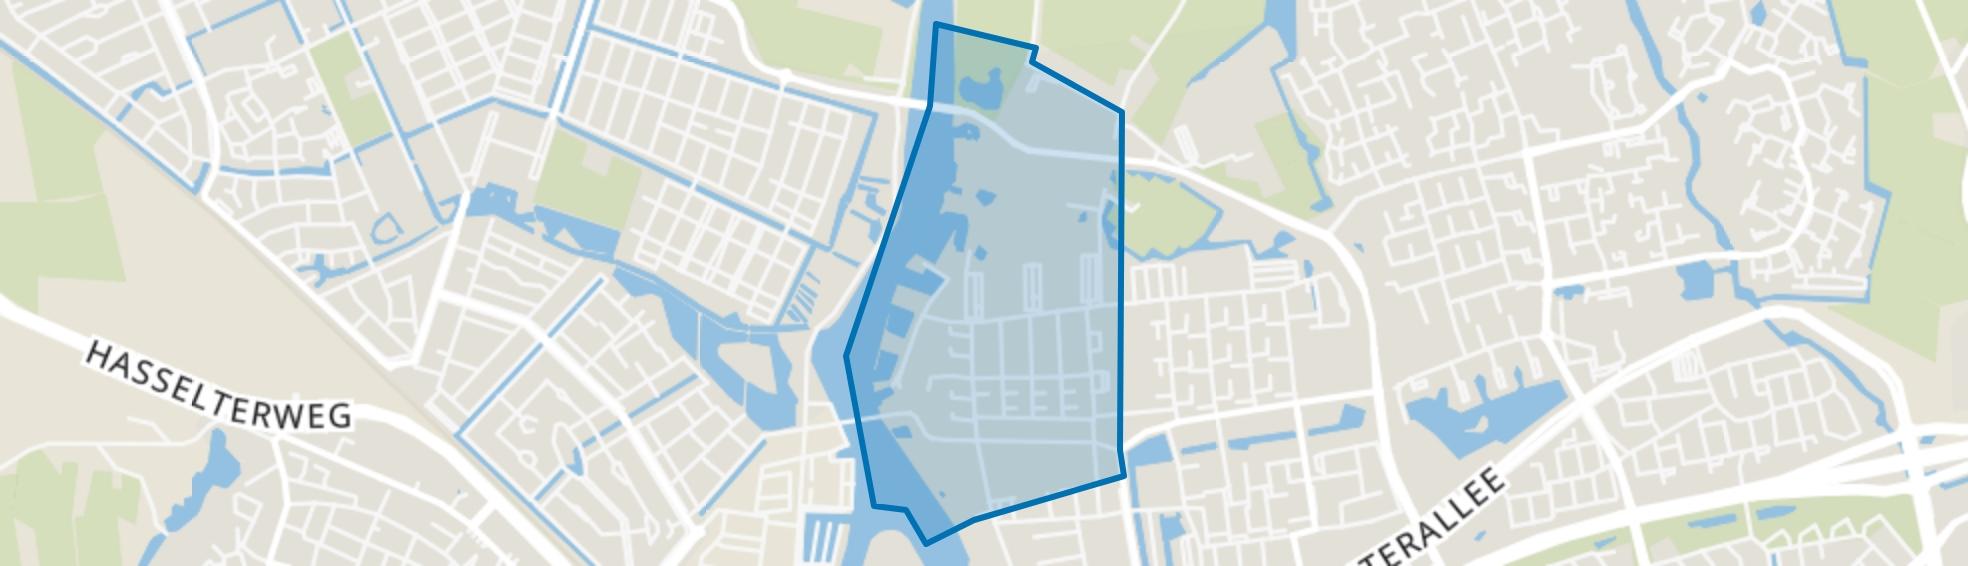 Holtenbroek II, Zwolle map